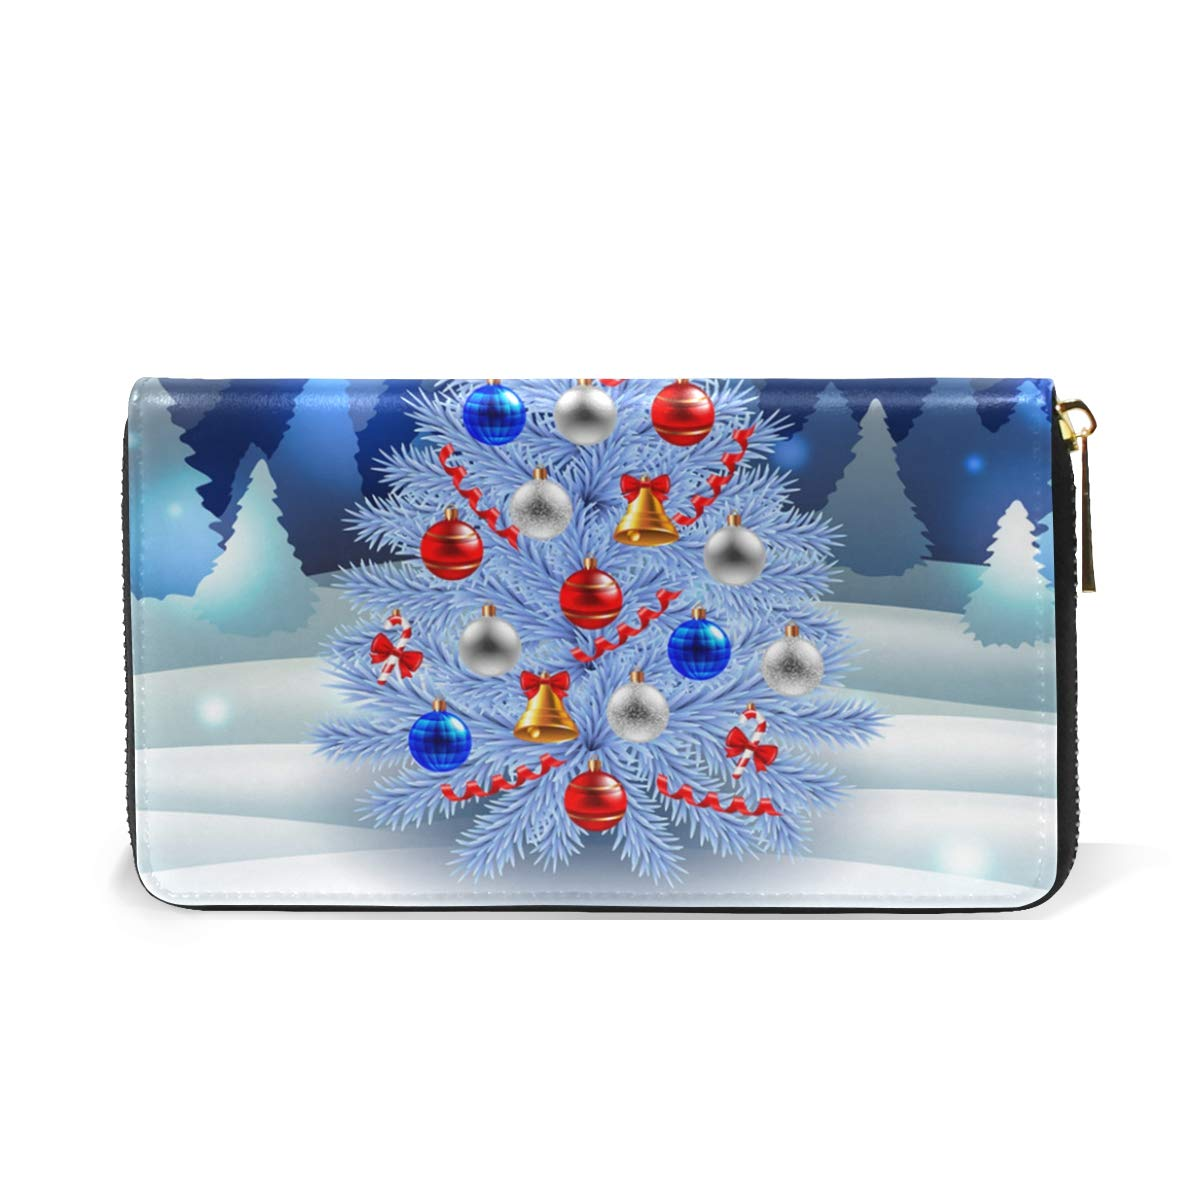 Bells Christmas Tree Ornaments Real Leather Zip Around Wallet Wristlet minimalist wallet Travel Purse Wristlet